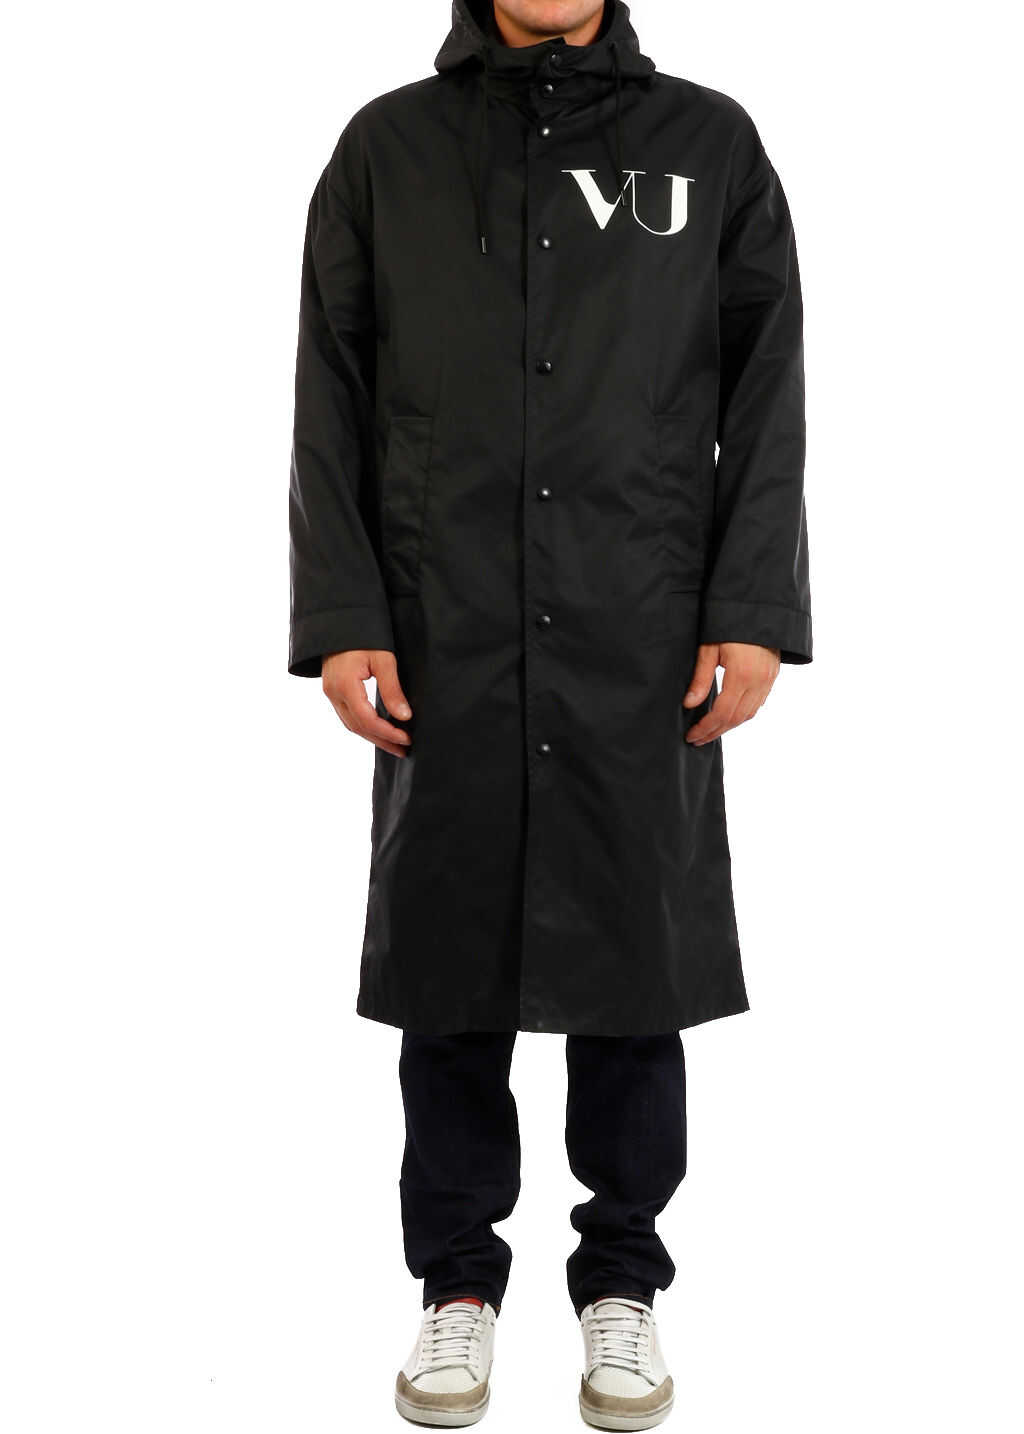 Valentino Garavani Raincoat Undercover Ufo Black imagine